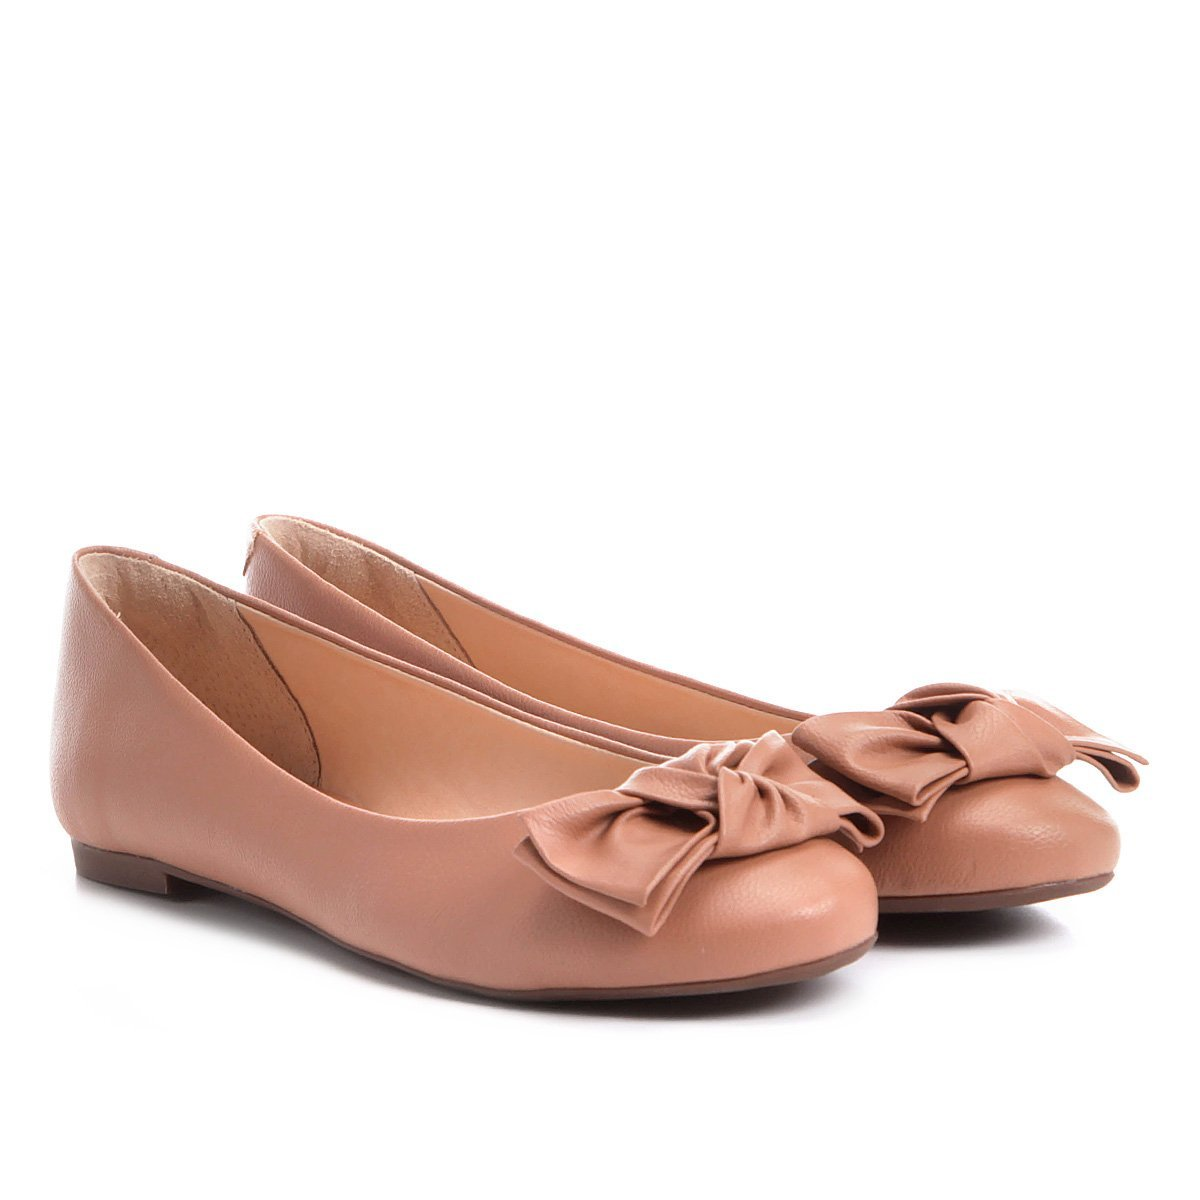 3dca9b2874 Sapatilha Shoestock Bico Redondo Laço Feminina - Nude - Compre Agora ...